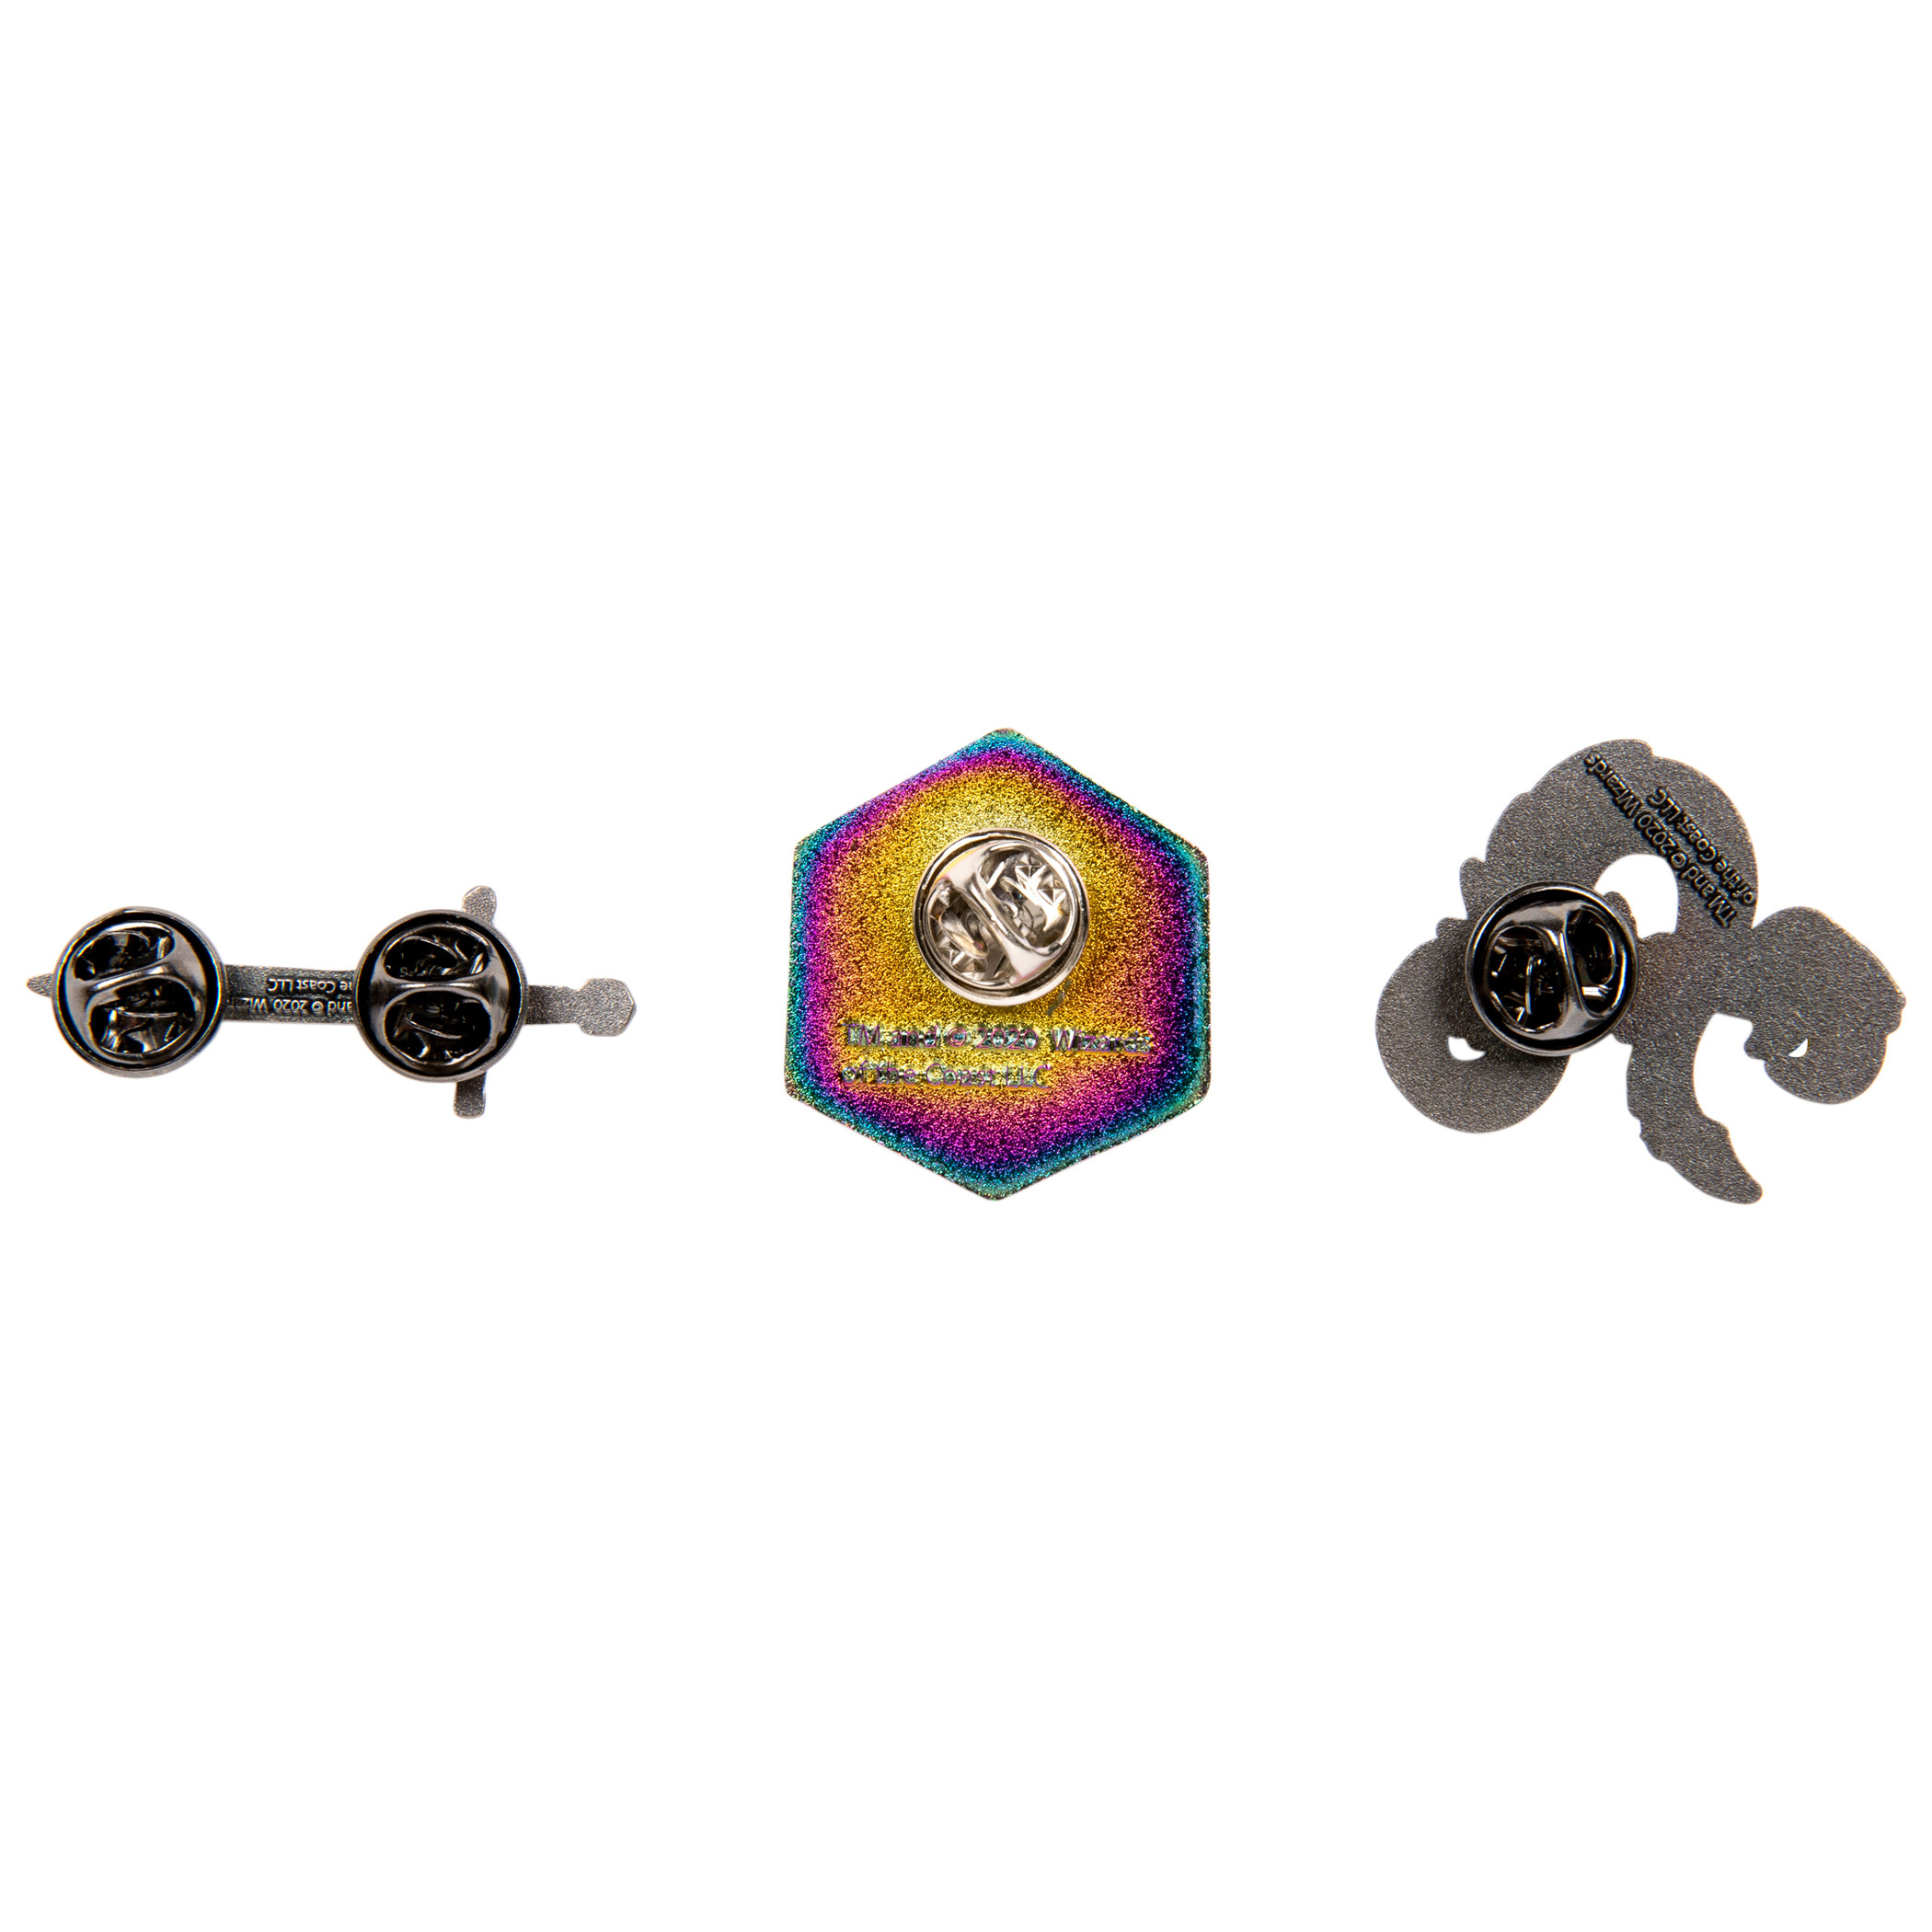 Dungeons & Dragons Logo D20 Sword Set of 3 Lapel Pins